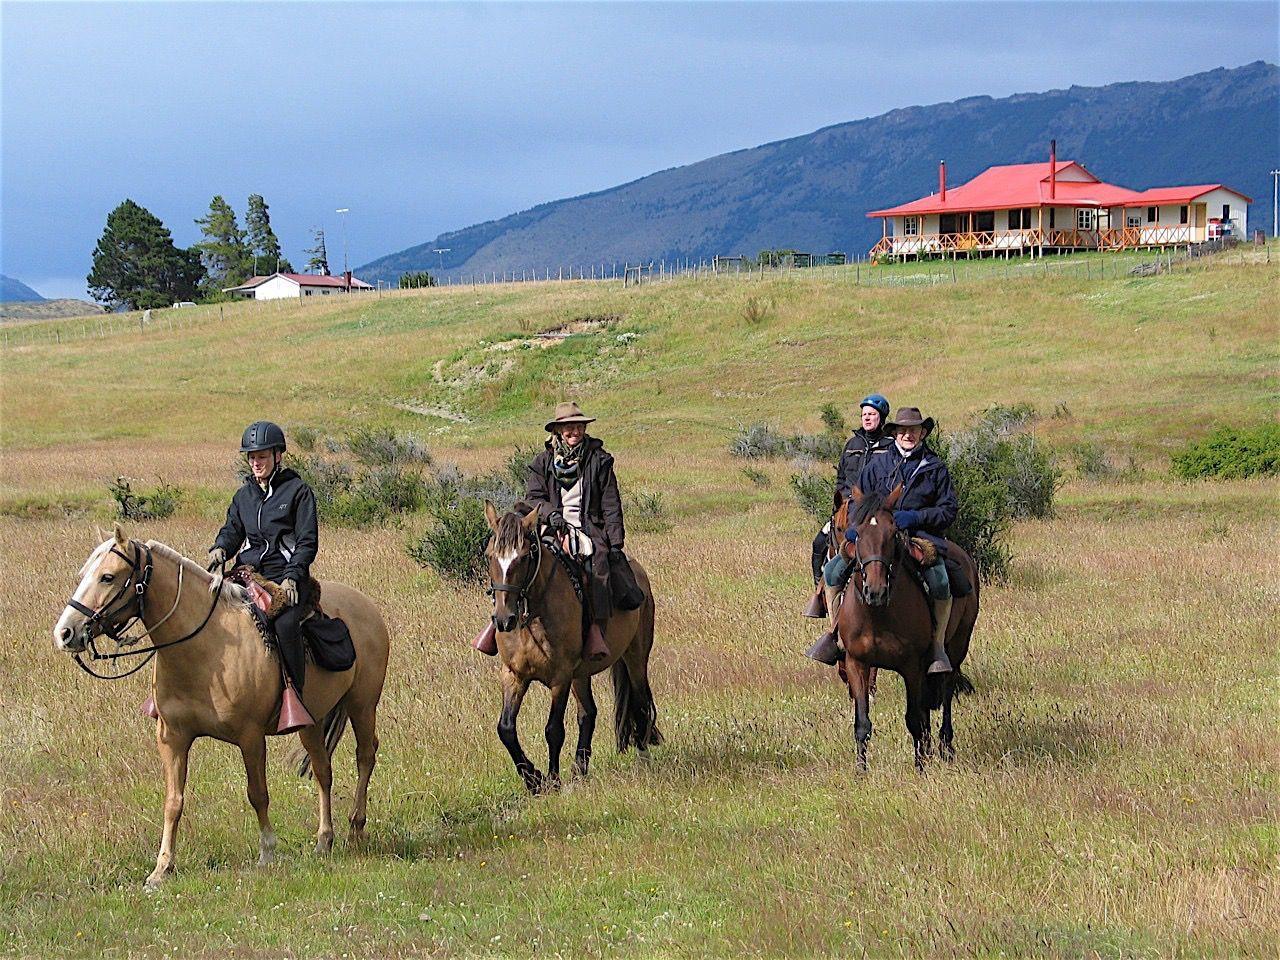 4 men on horses at Sofia Lake Horseback Ride near NOI Indigo